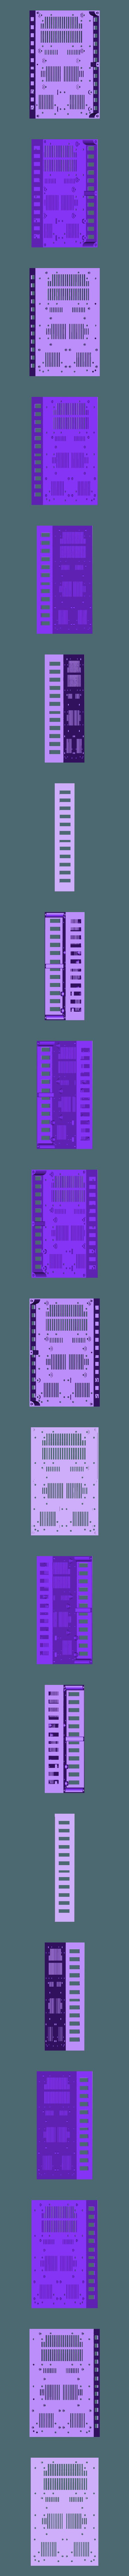 Caja_XXL_Zonestar_Zrib_para_3_Mosfet.stl Télécharger fichier STL gratuit Caja XXL para placa Zonestar ZRIB para montar 3 Mosfet • Modèle à imprimer en 3D, celtarra12